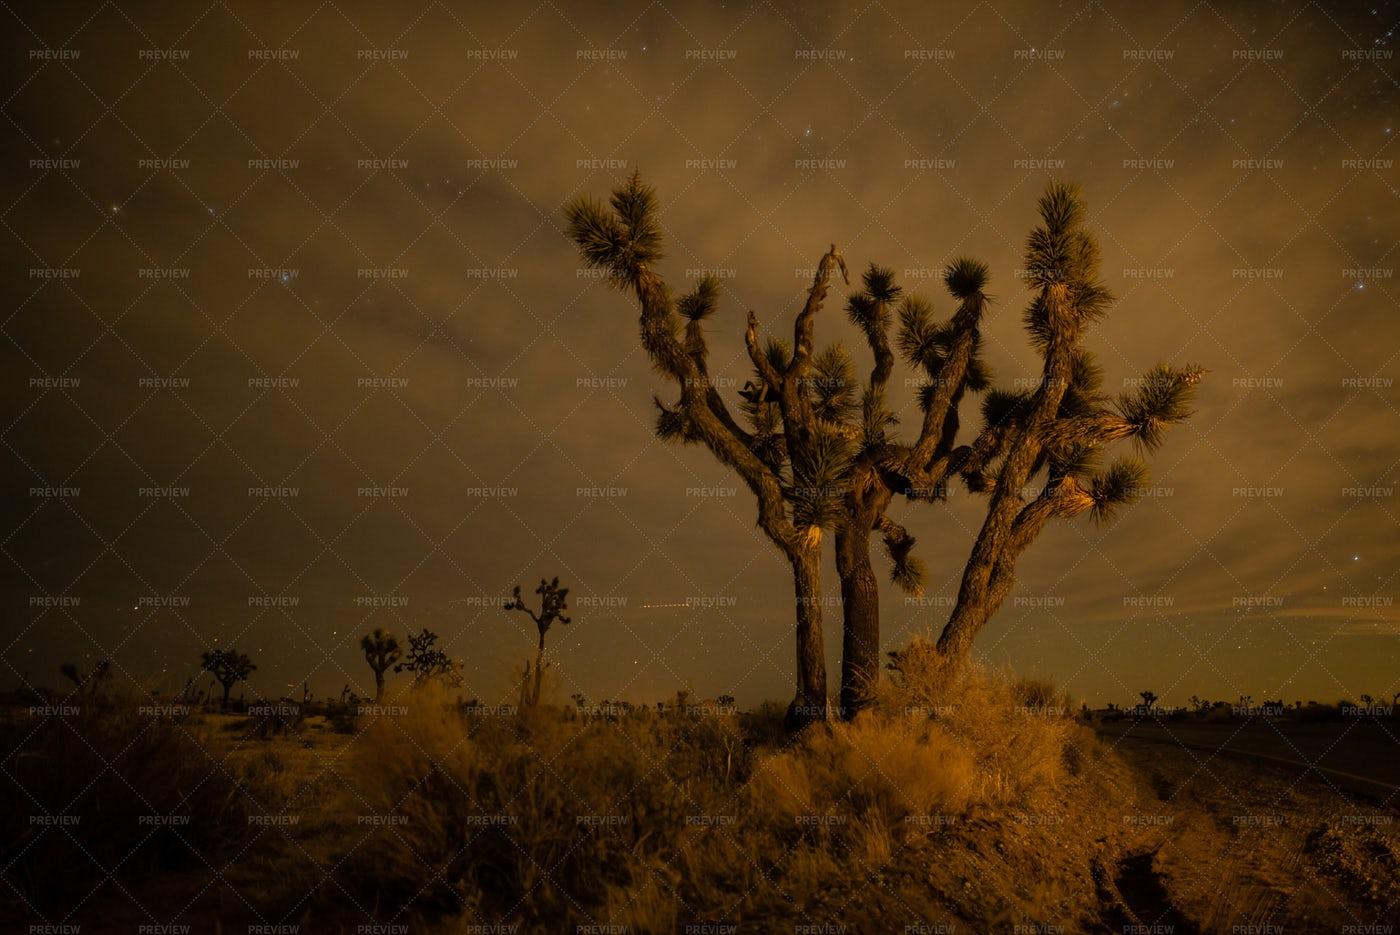 Joshua Tree In The Desert: Stock Photos